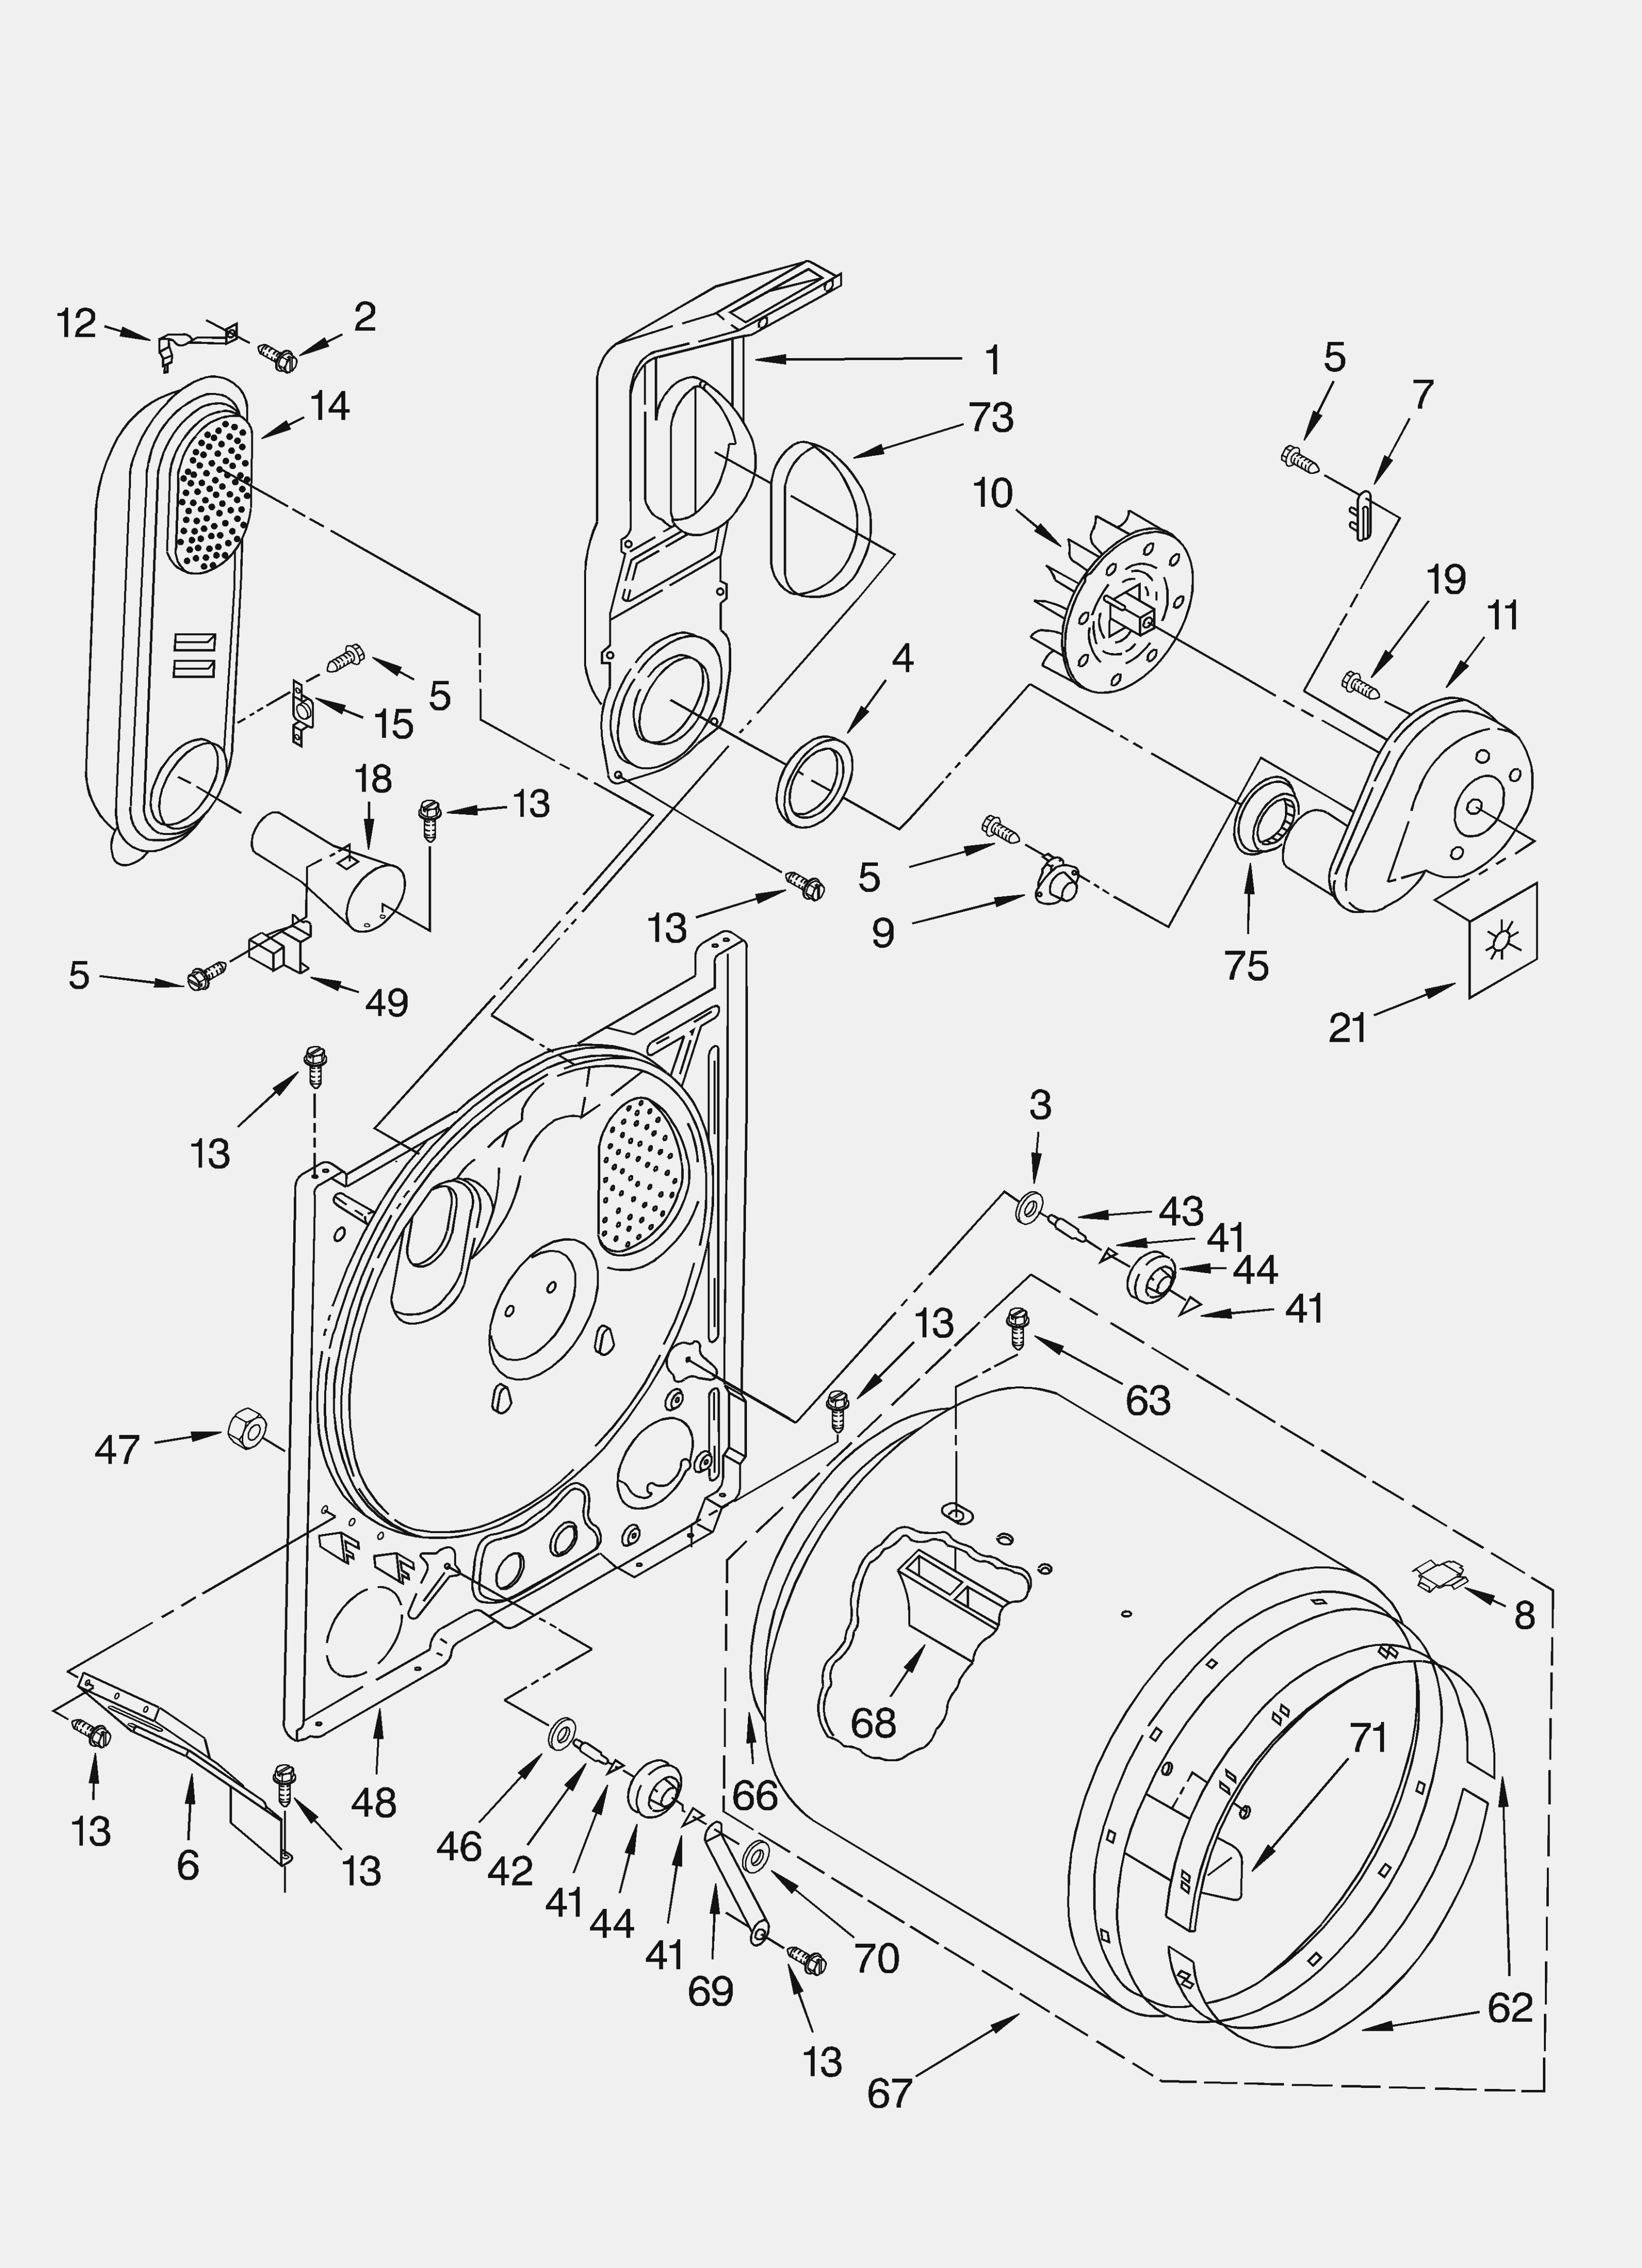 AH_1855] Estate Dryer Wiring Diagram Wiring DiagramWww Mohammedshrine Librar Wiring 101